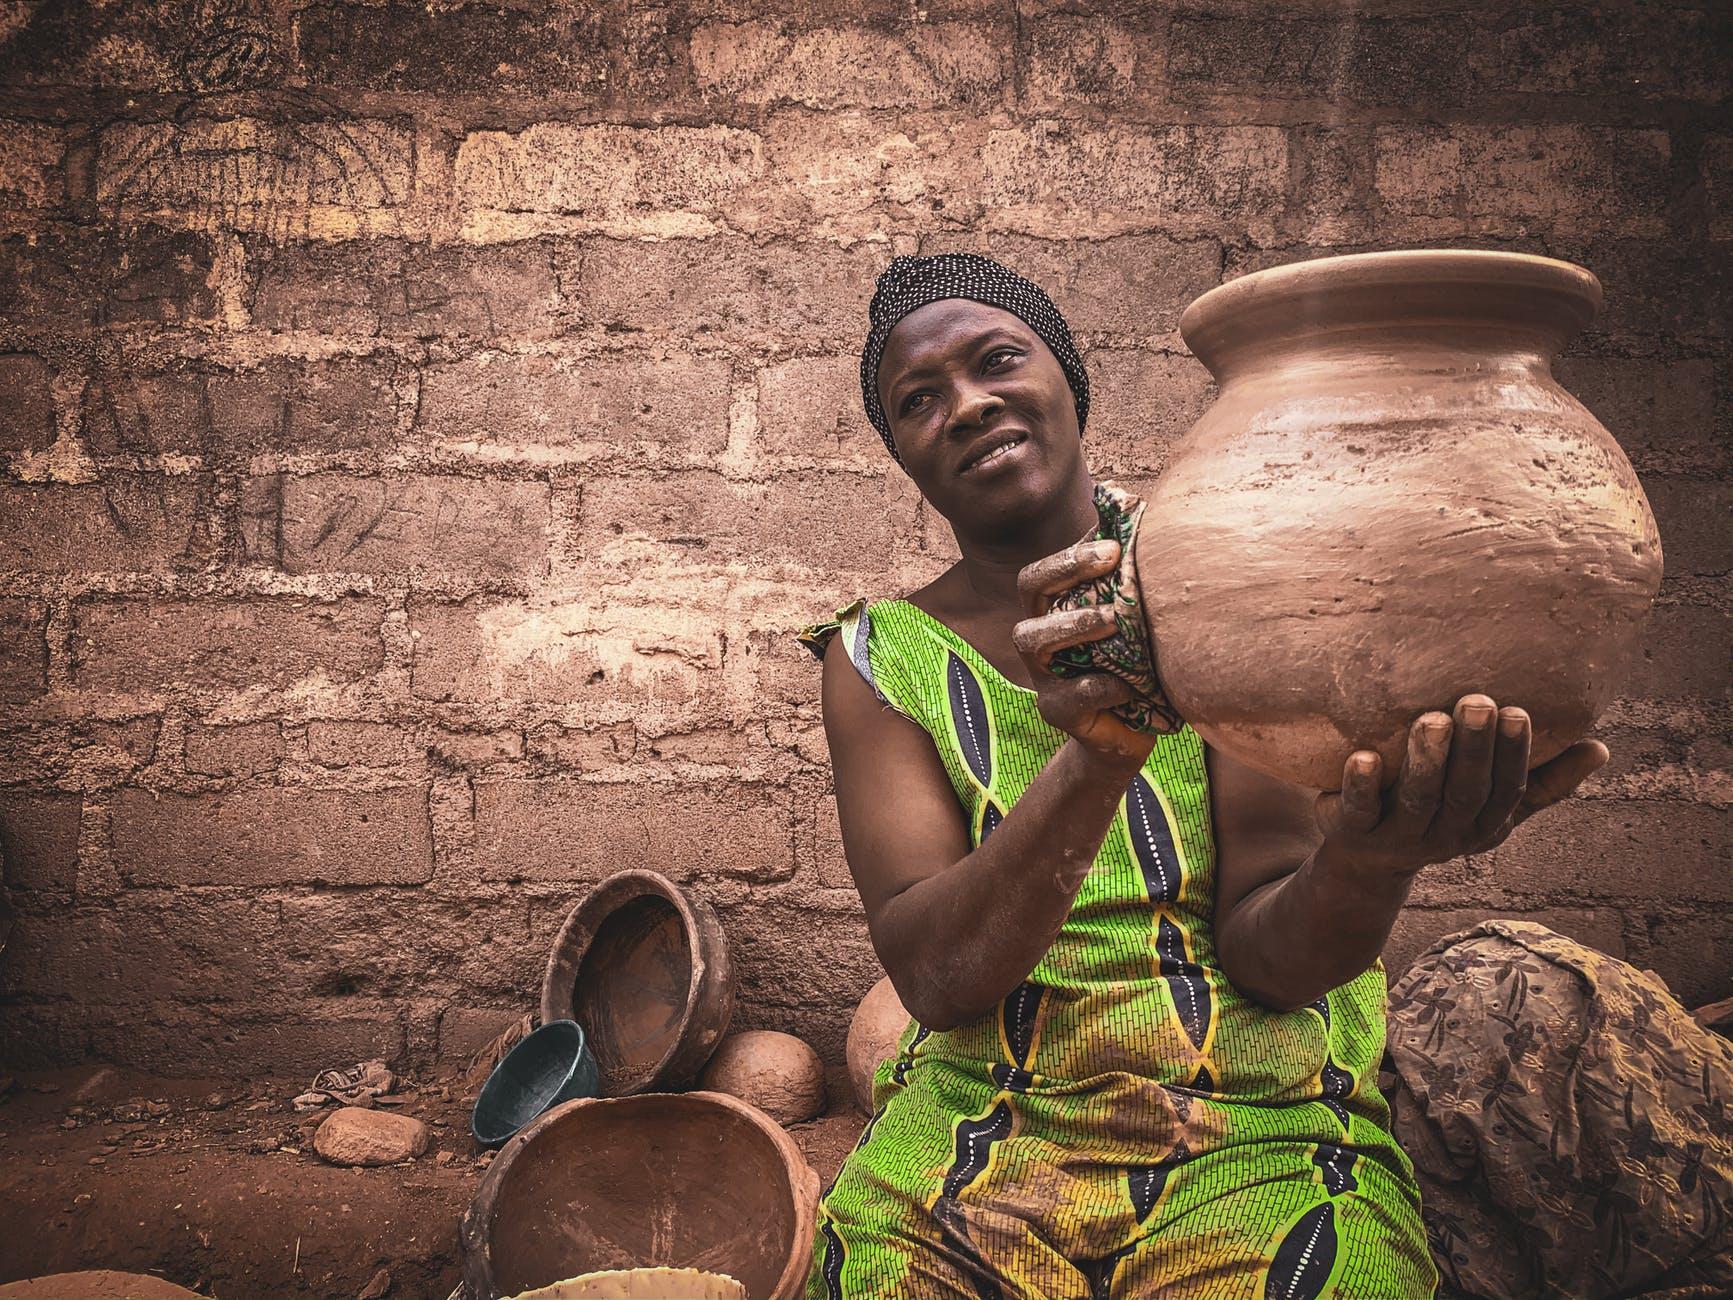 african woman showing handicraft earthenware in local workshop